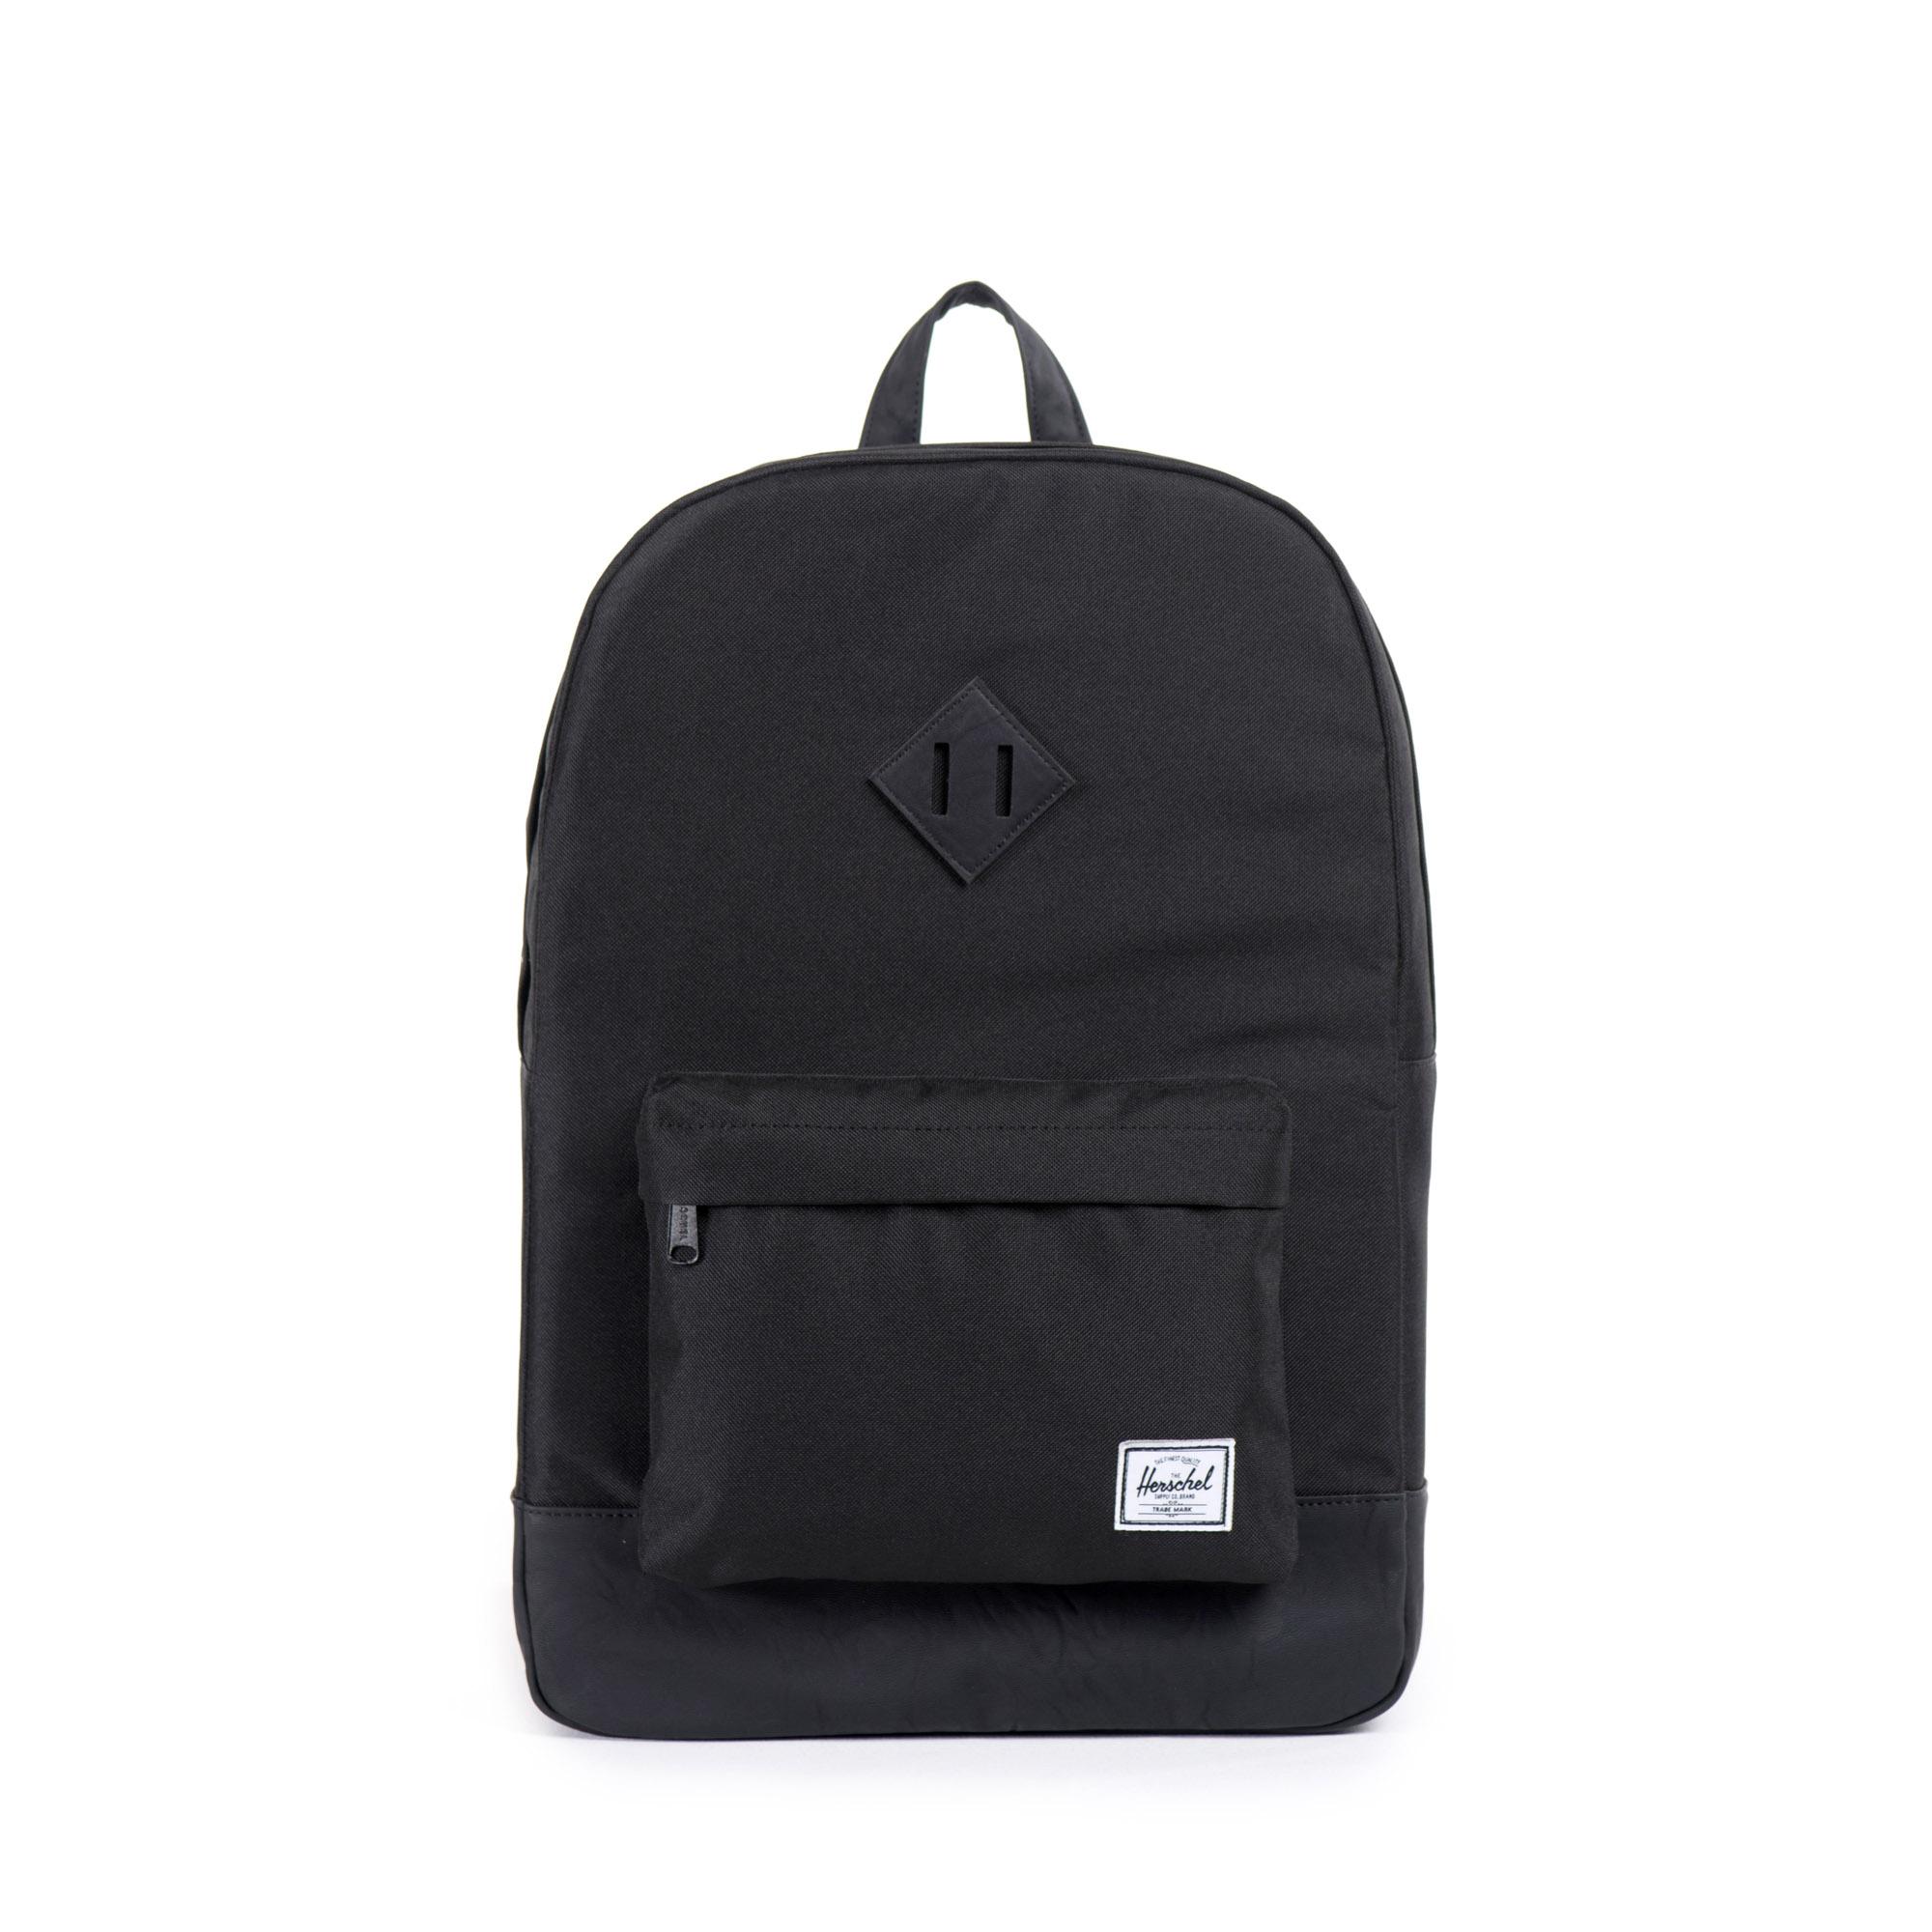 2c3497735dc0 Details about Herschel Heritage 21.5 Litre Back Pack Black Black Synthetic  Leather